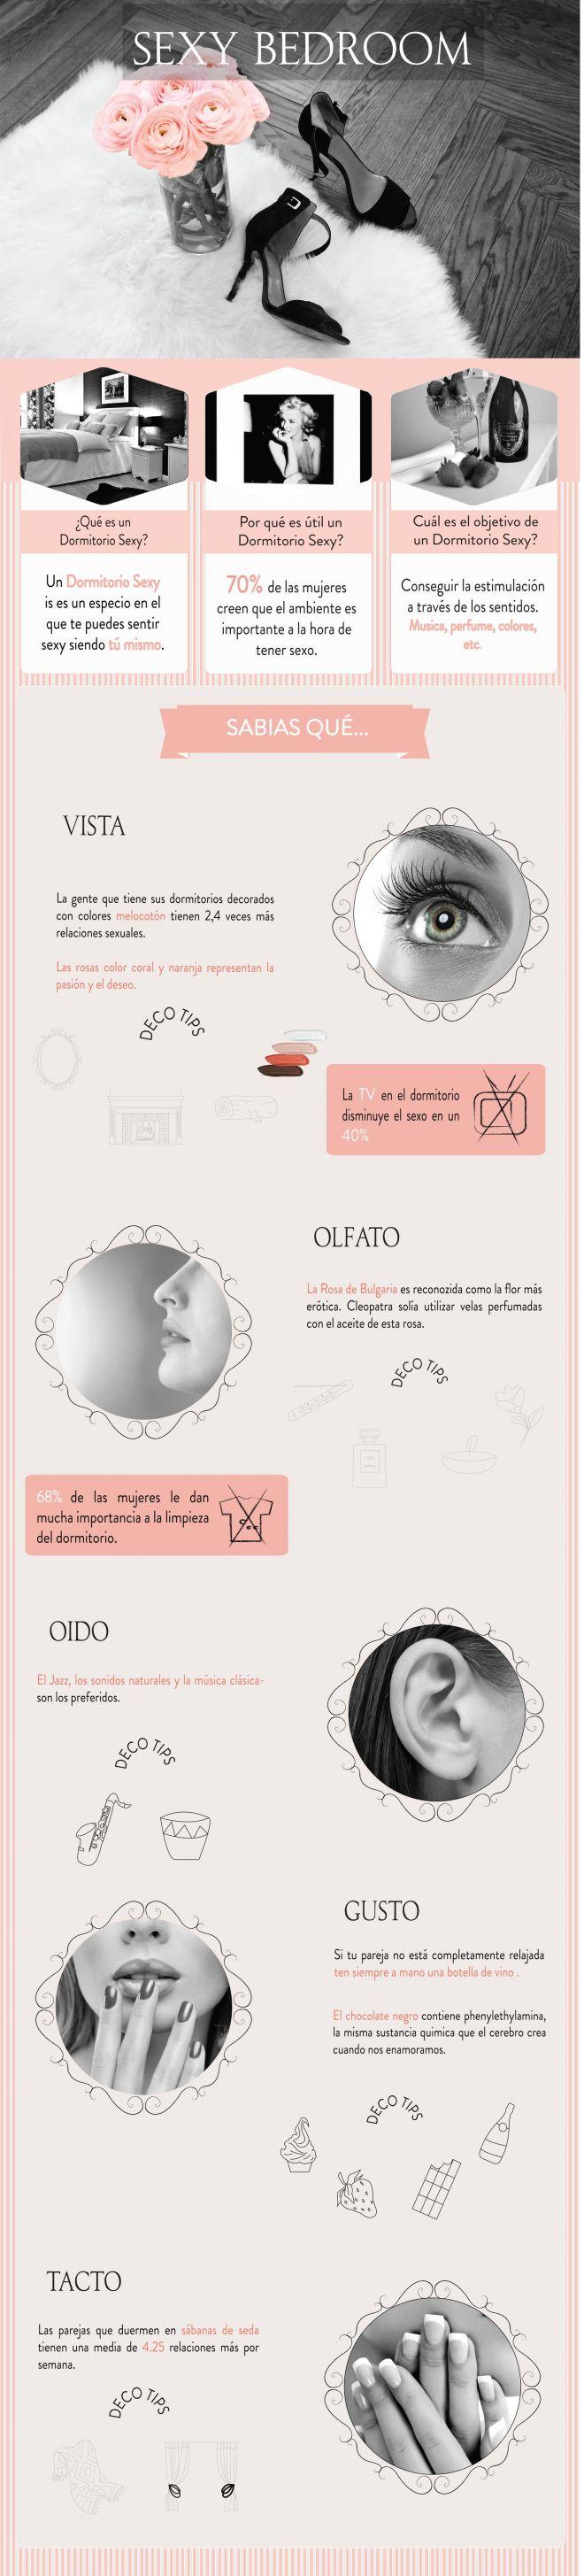 Dormitorio sexy infografía